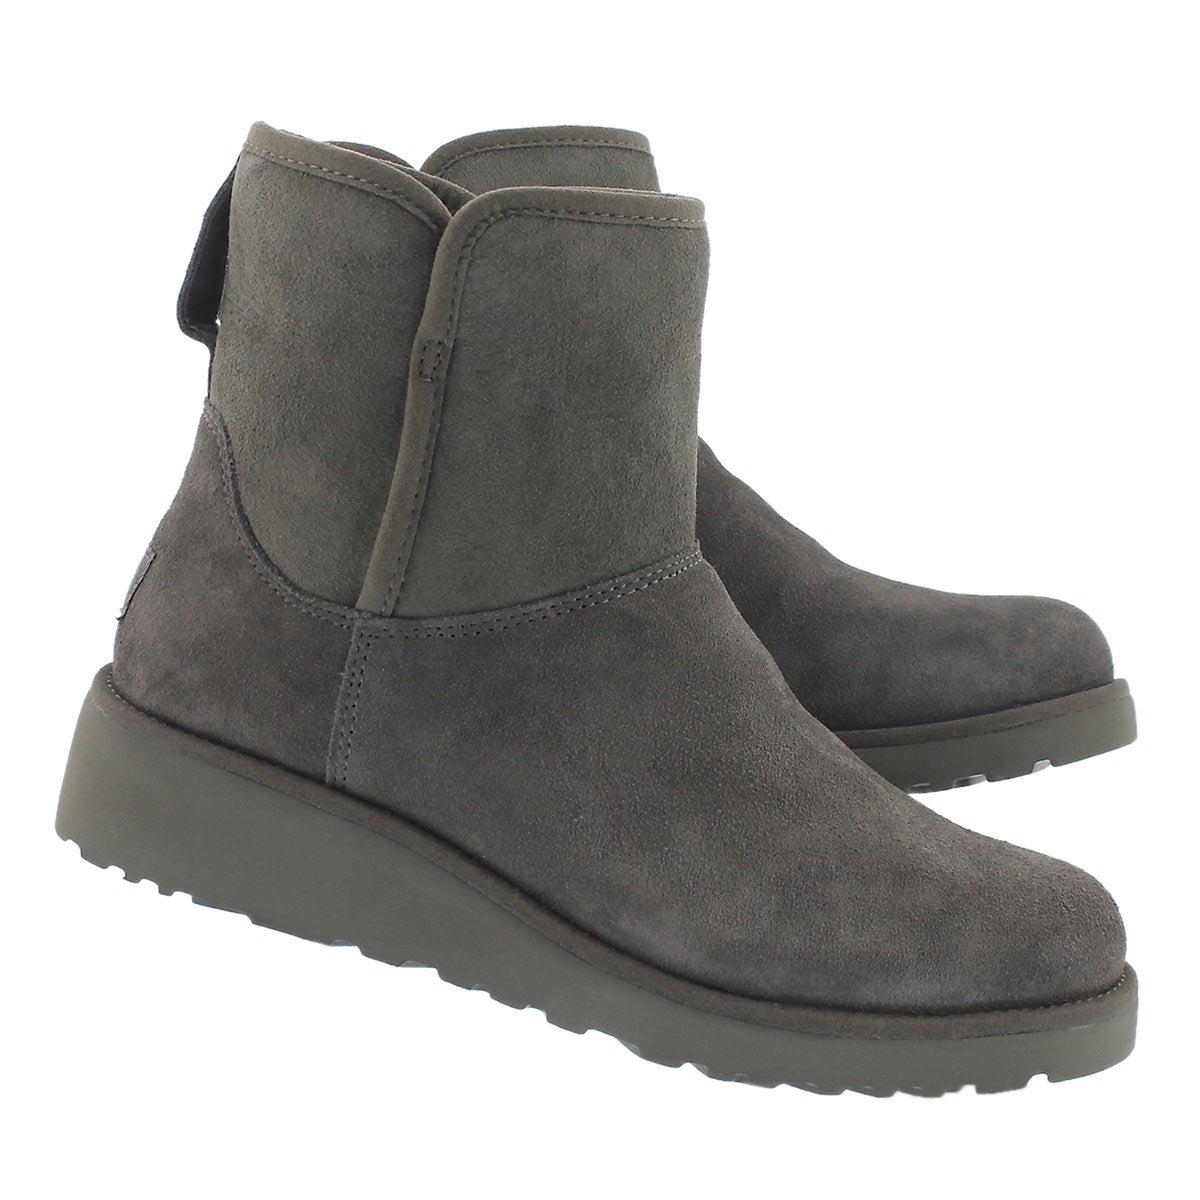 Lds Kristin grey wedge sheepskin boot